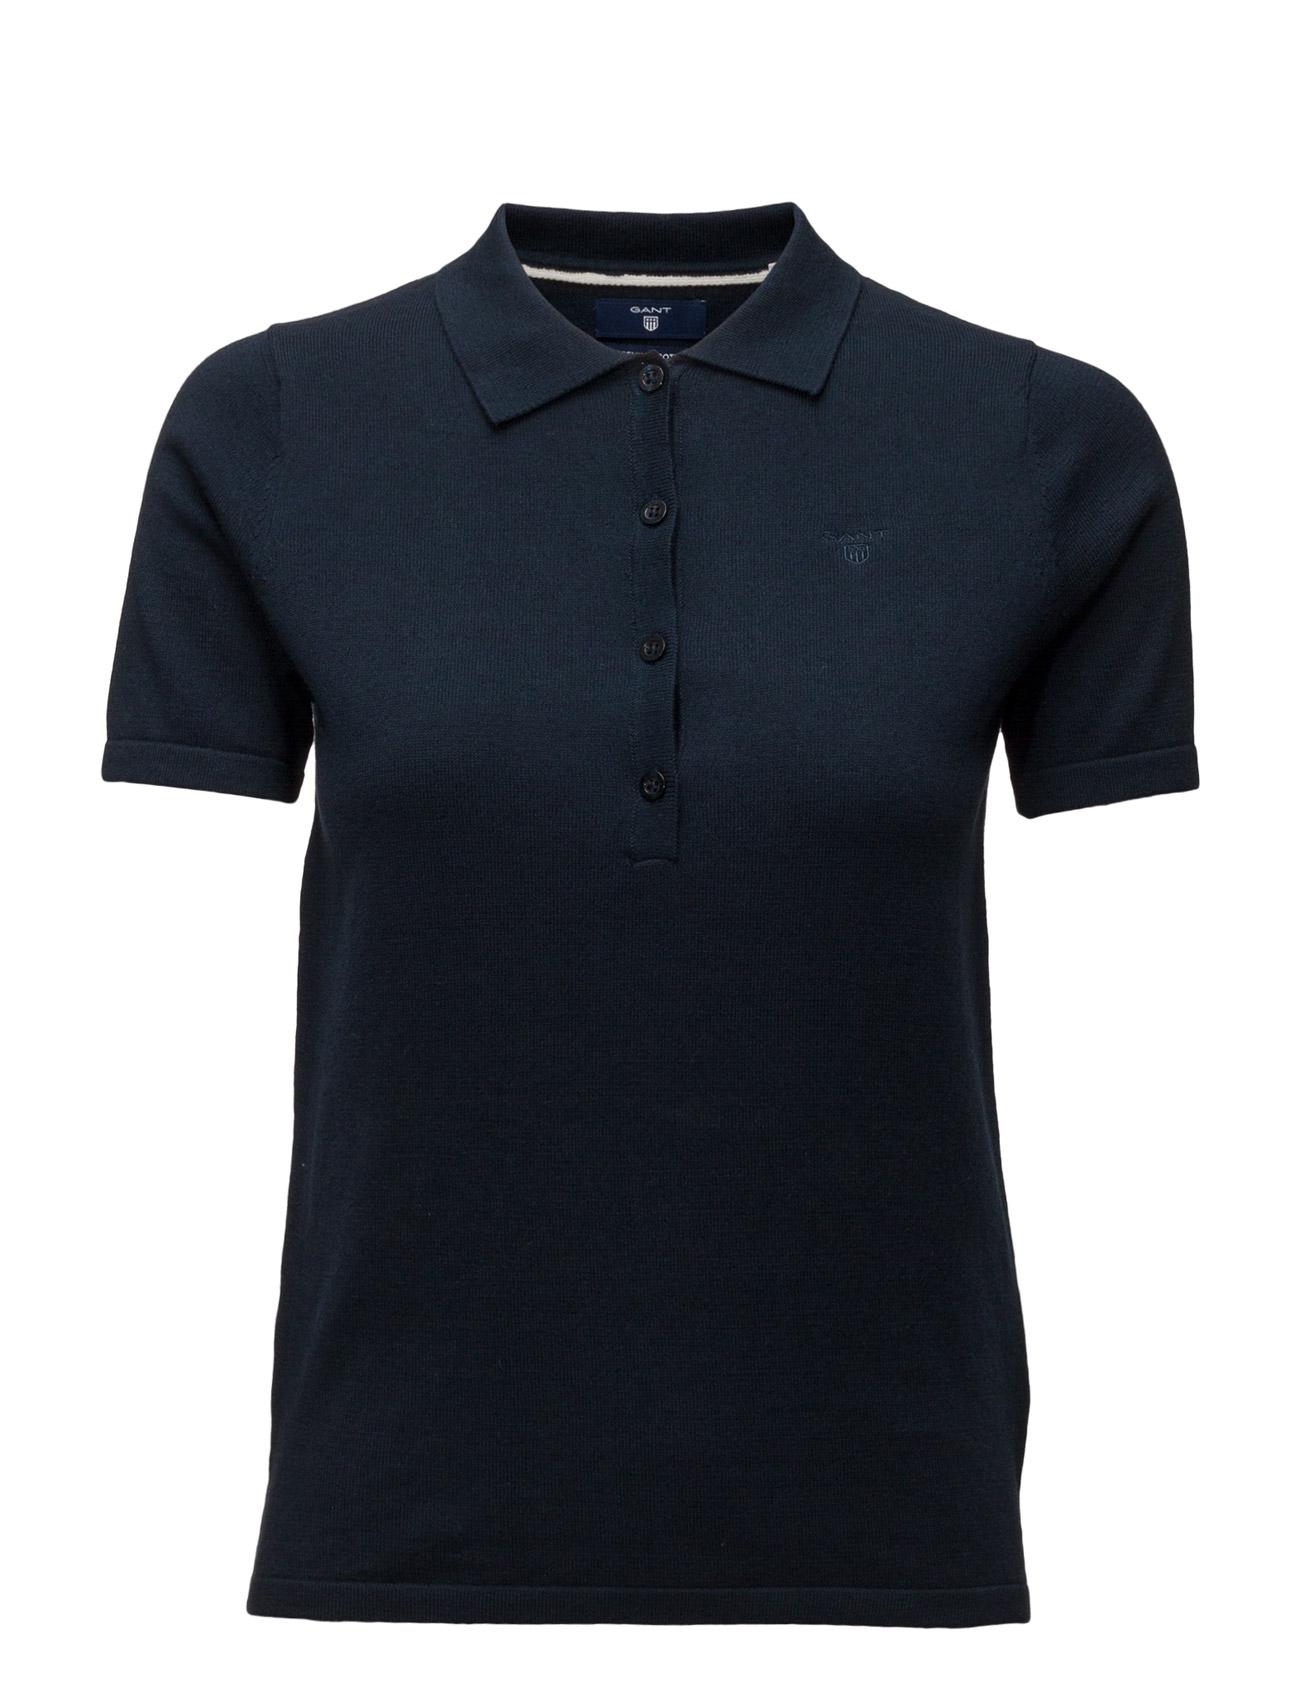 soft cotton polo shirt marine 400 kr gant